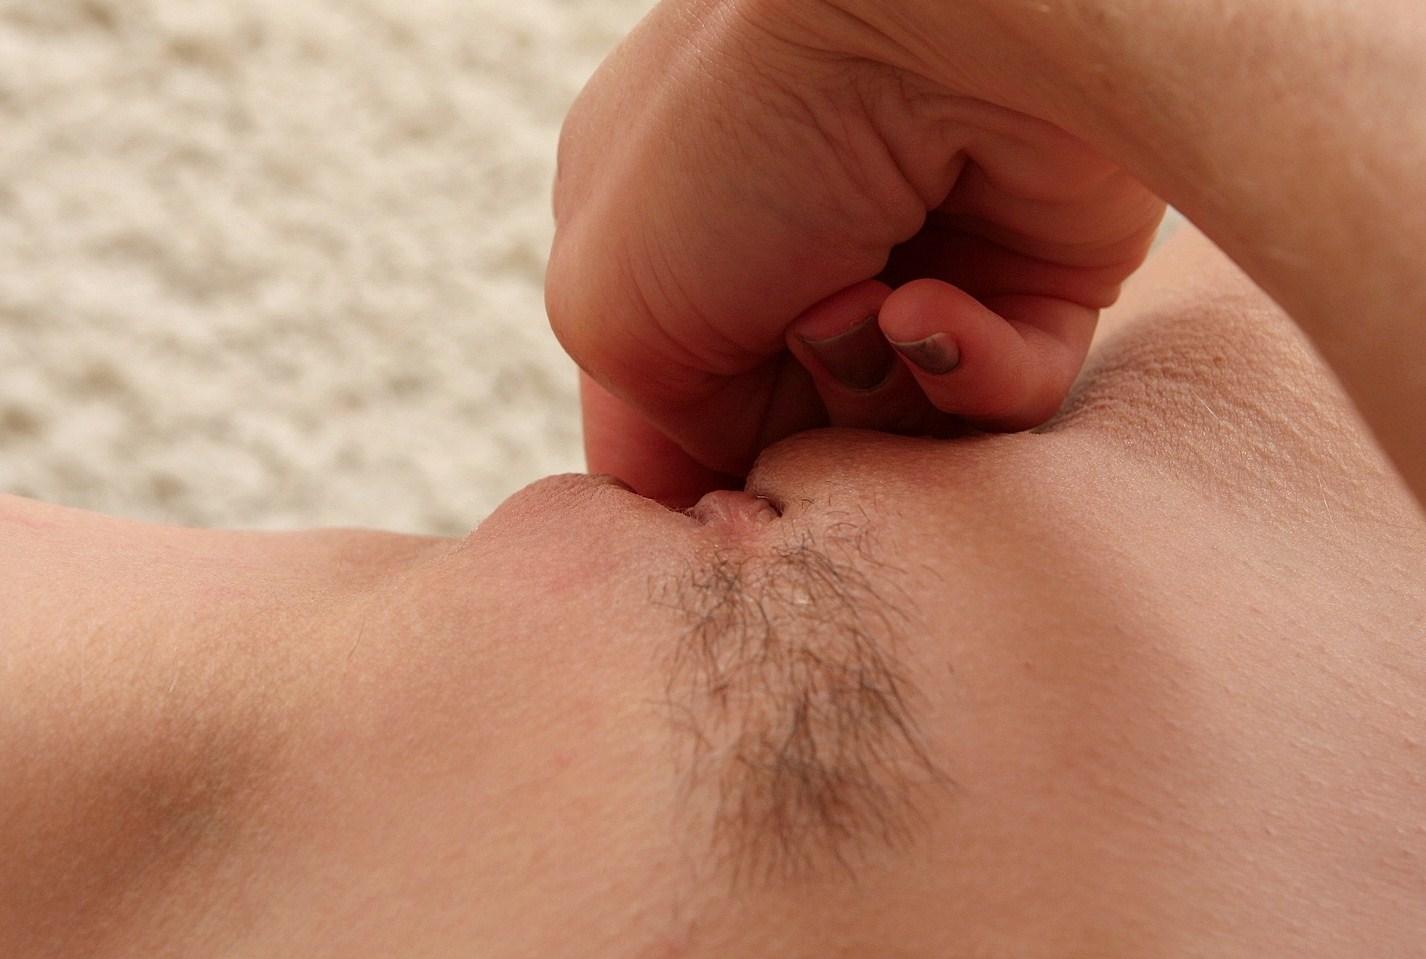 stimulera klitoris erotisk massage stockholm